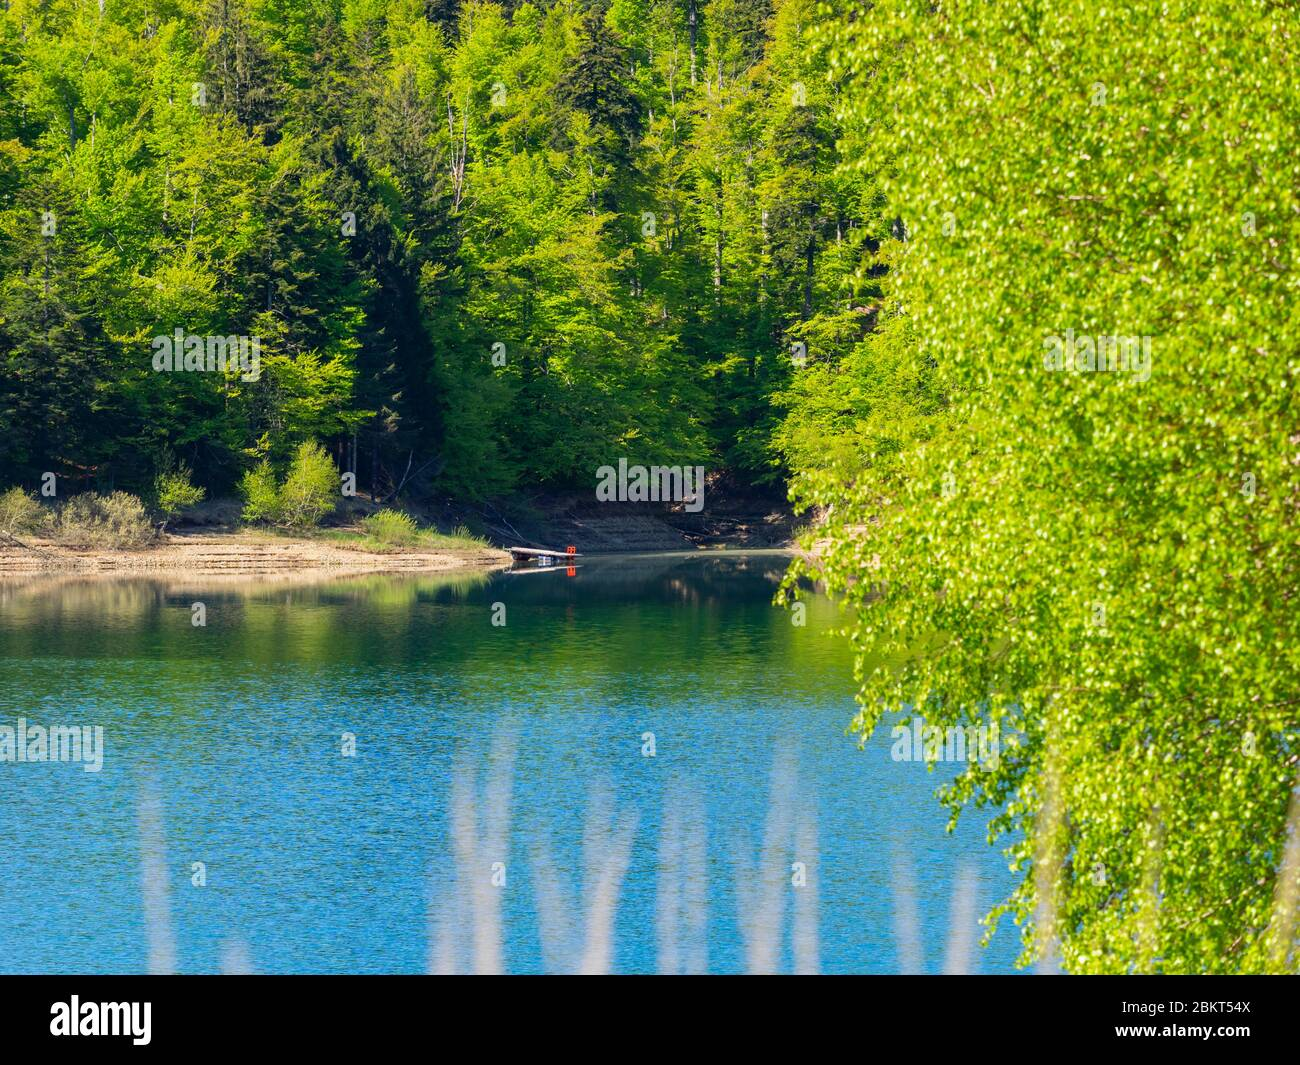 Spring season in Green forest woodland Lokve lake Croatia Europe Stock Photo